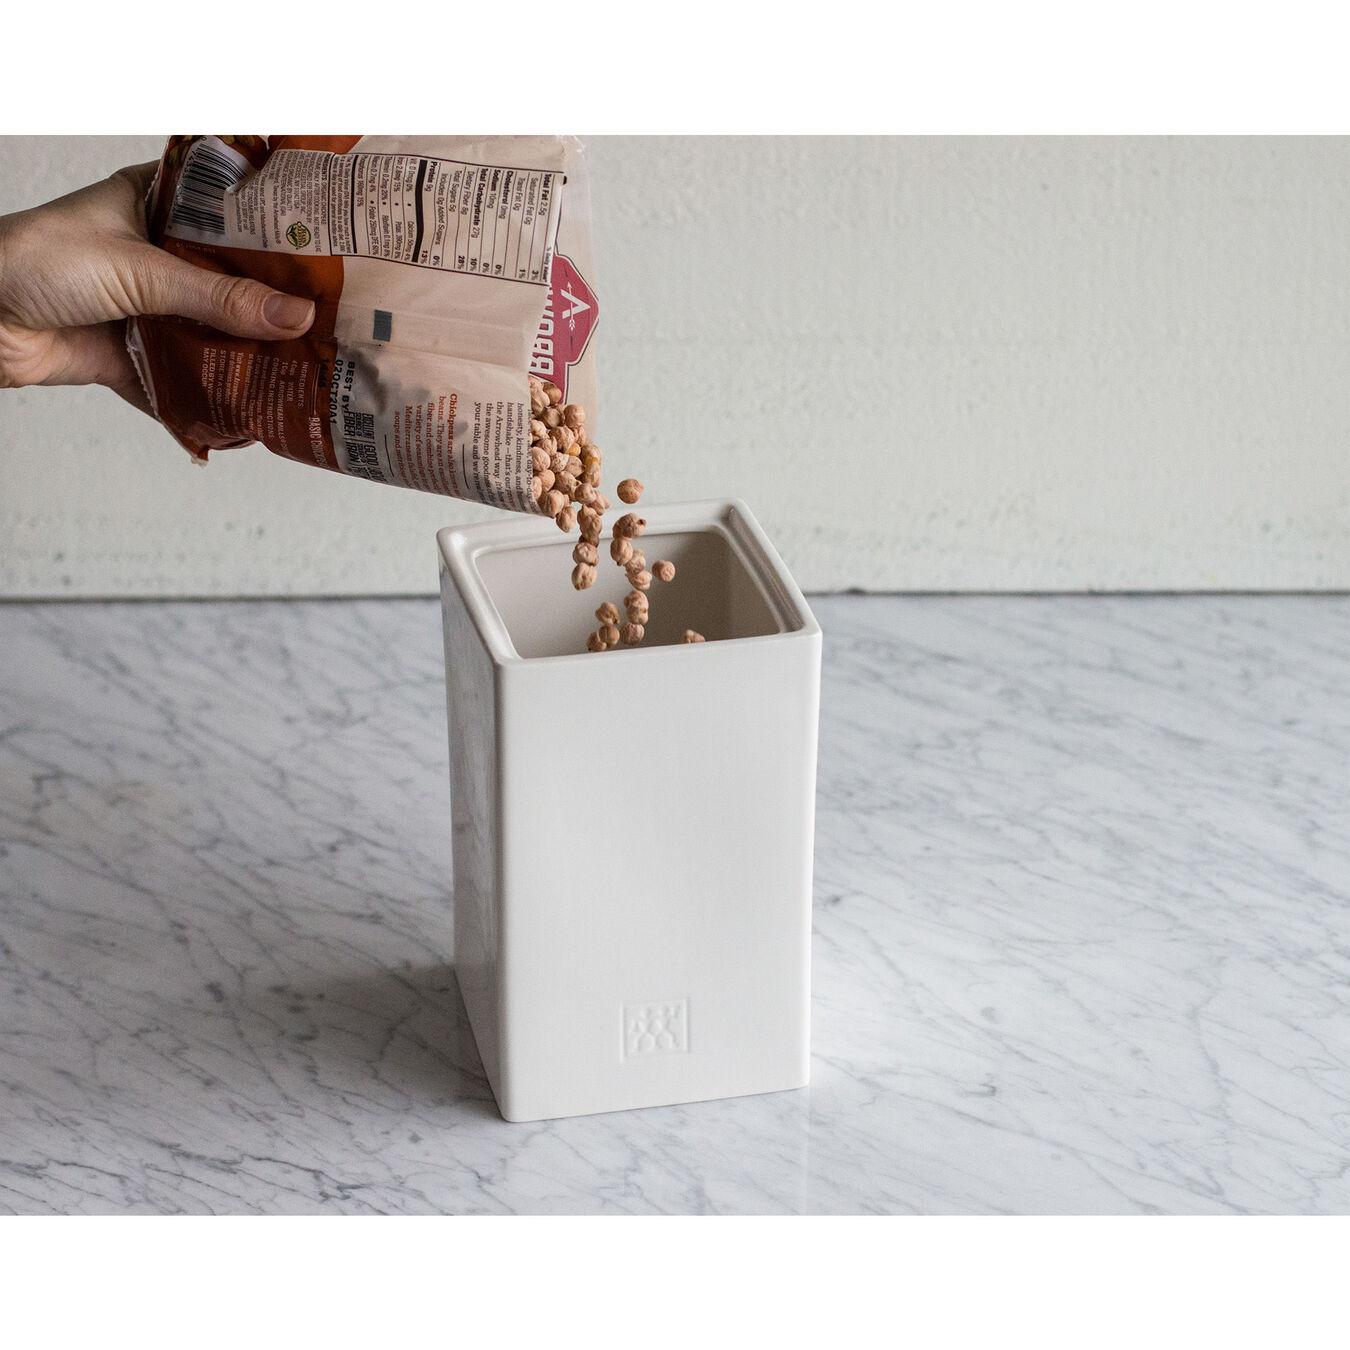 1.5 qt, ceramic, Large Box with knife lid  ,,large 2